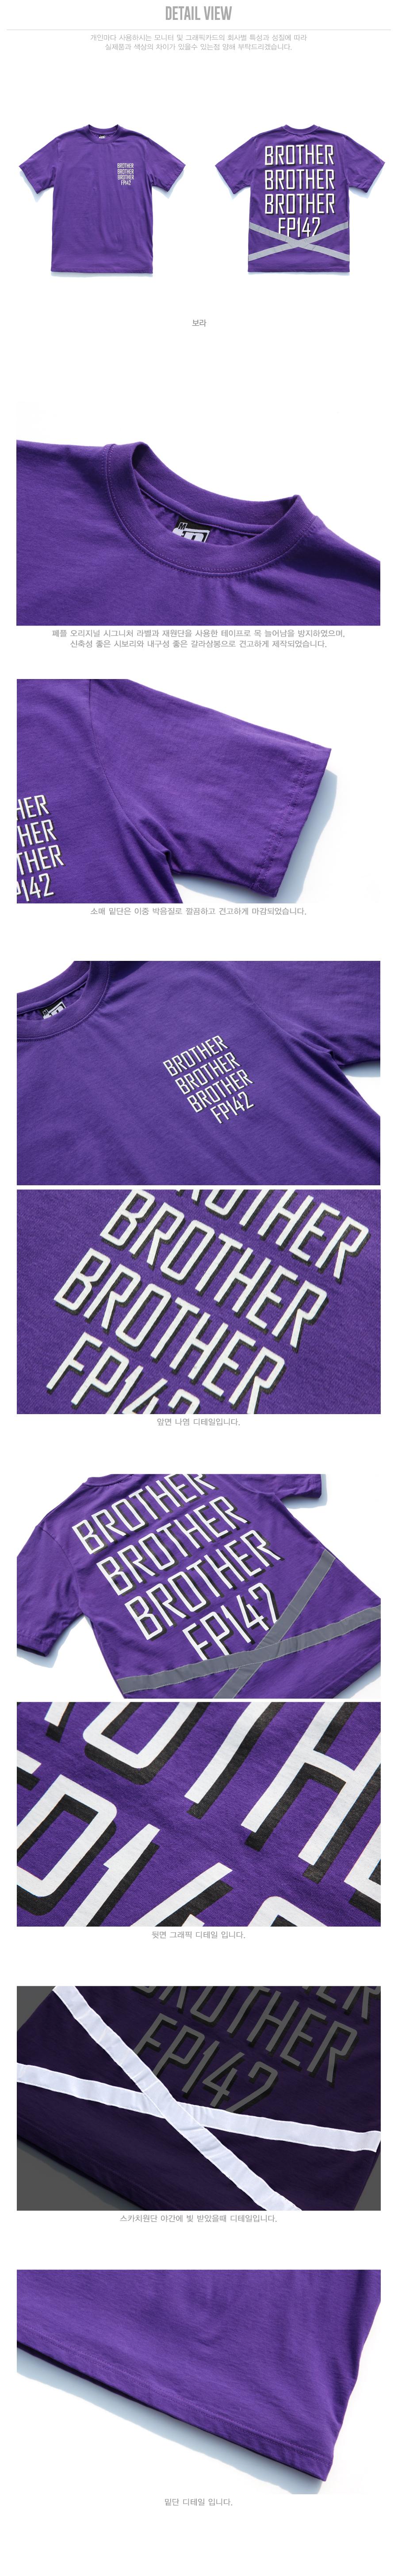 20180423_fp_brother_short_tee_purple_ms.jpg